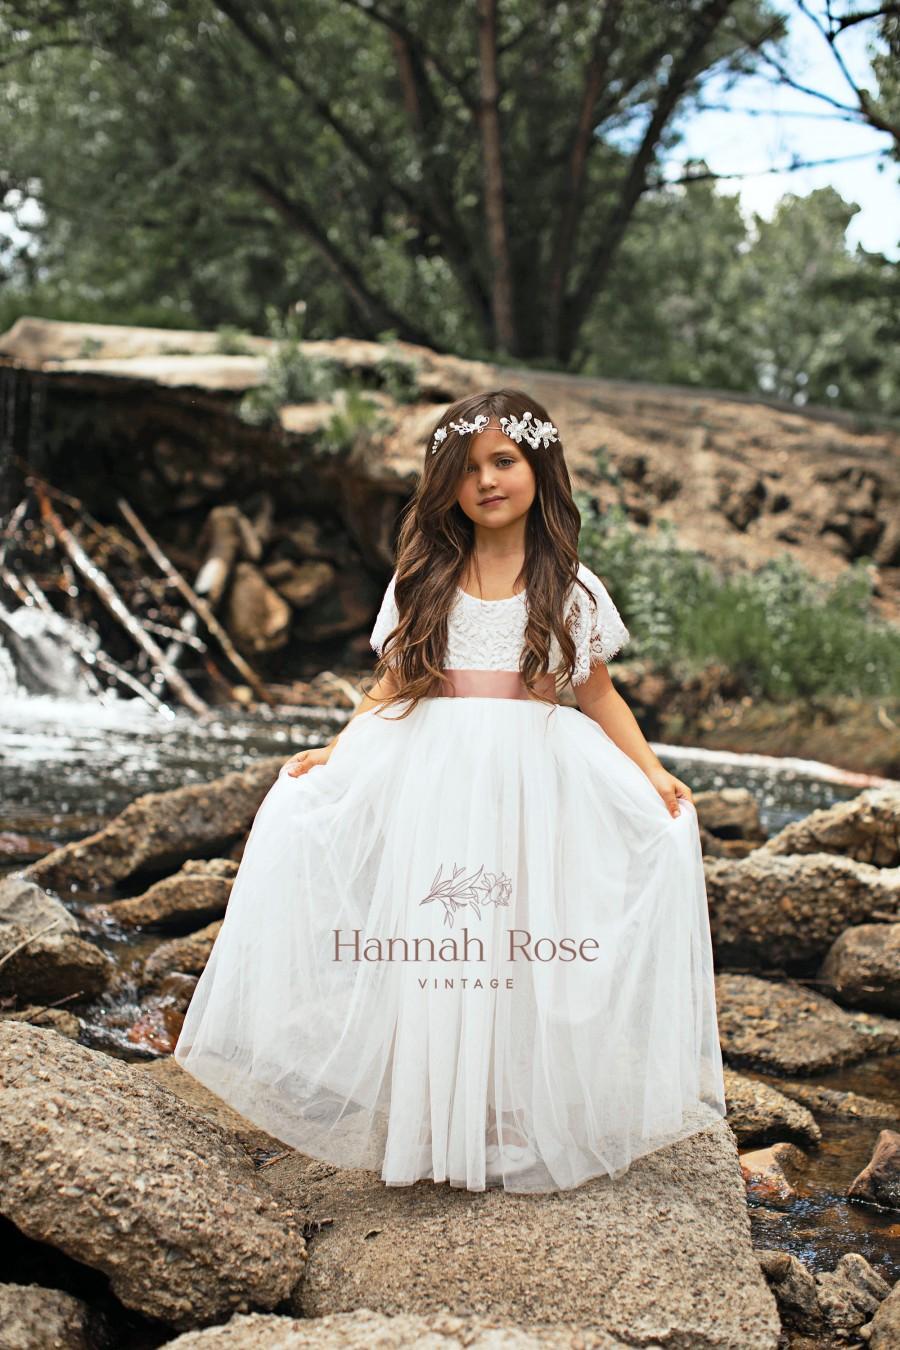 Hochzeit - Flower Girl Dress, Short Sleeve White, ivory, Sage Boho Vintage Tulle and Lace Flower Girl Dresses